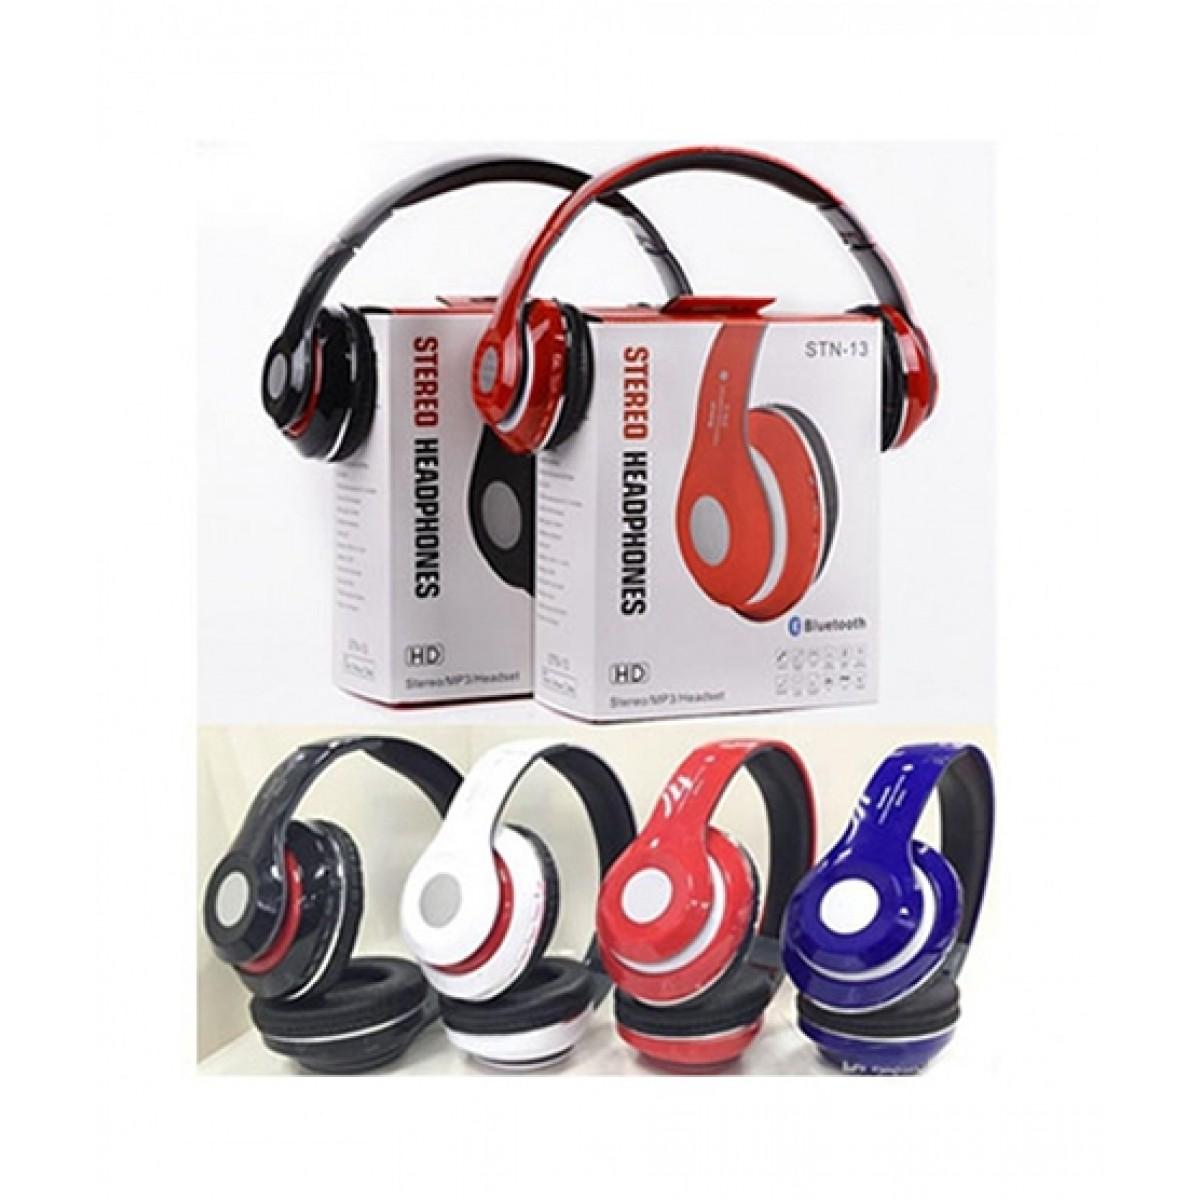 F.A Communications Wireless Bluetooth Headphone (STN-13)